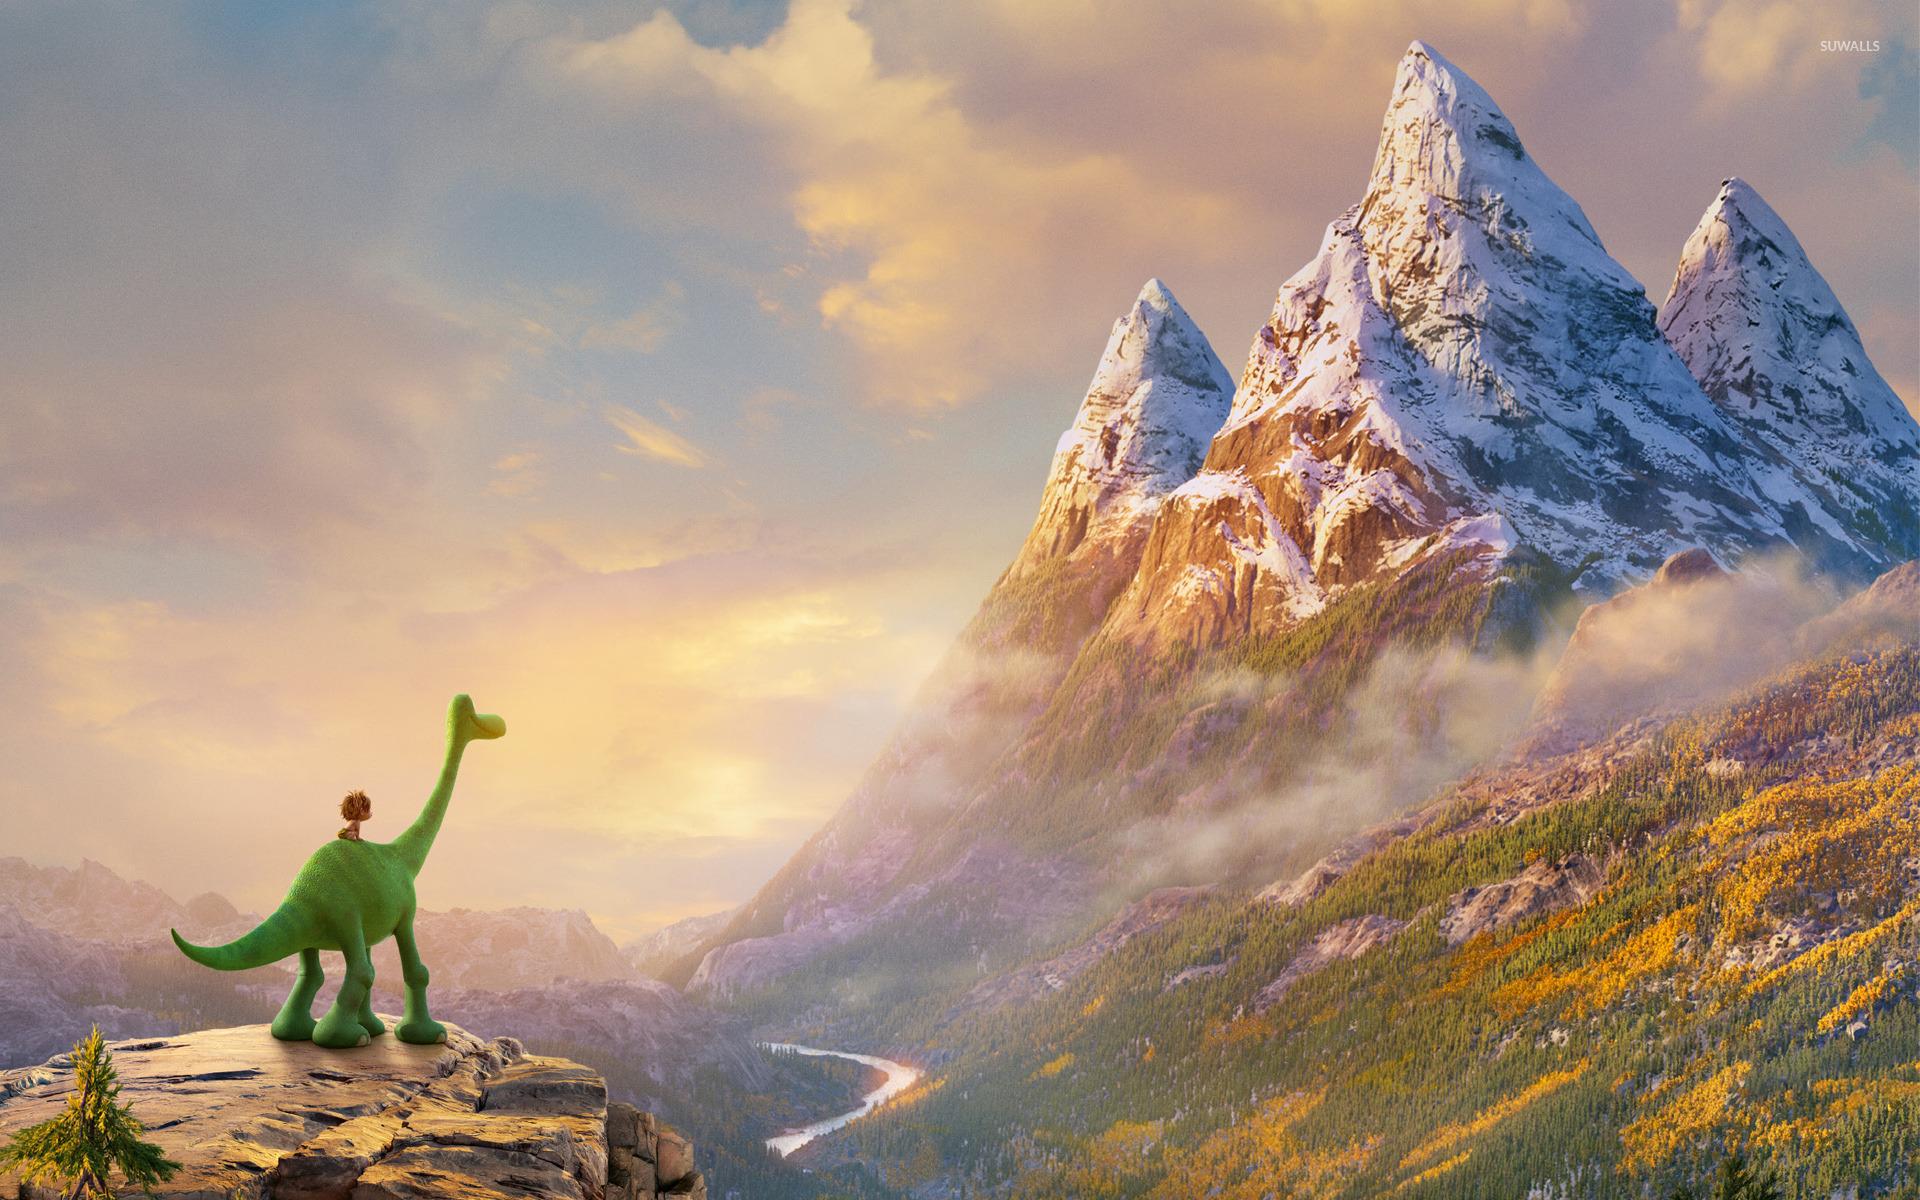 The Good Dinosaur wallpaper - Cartoon wallpapers - #44861